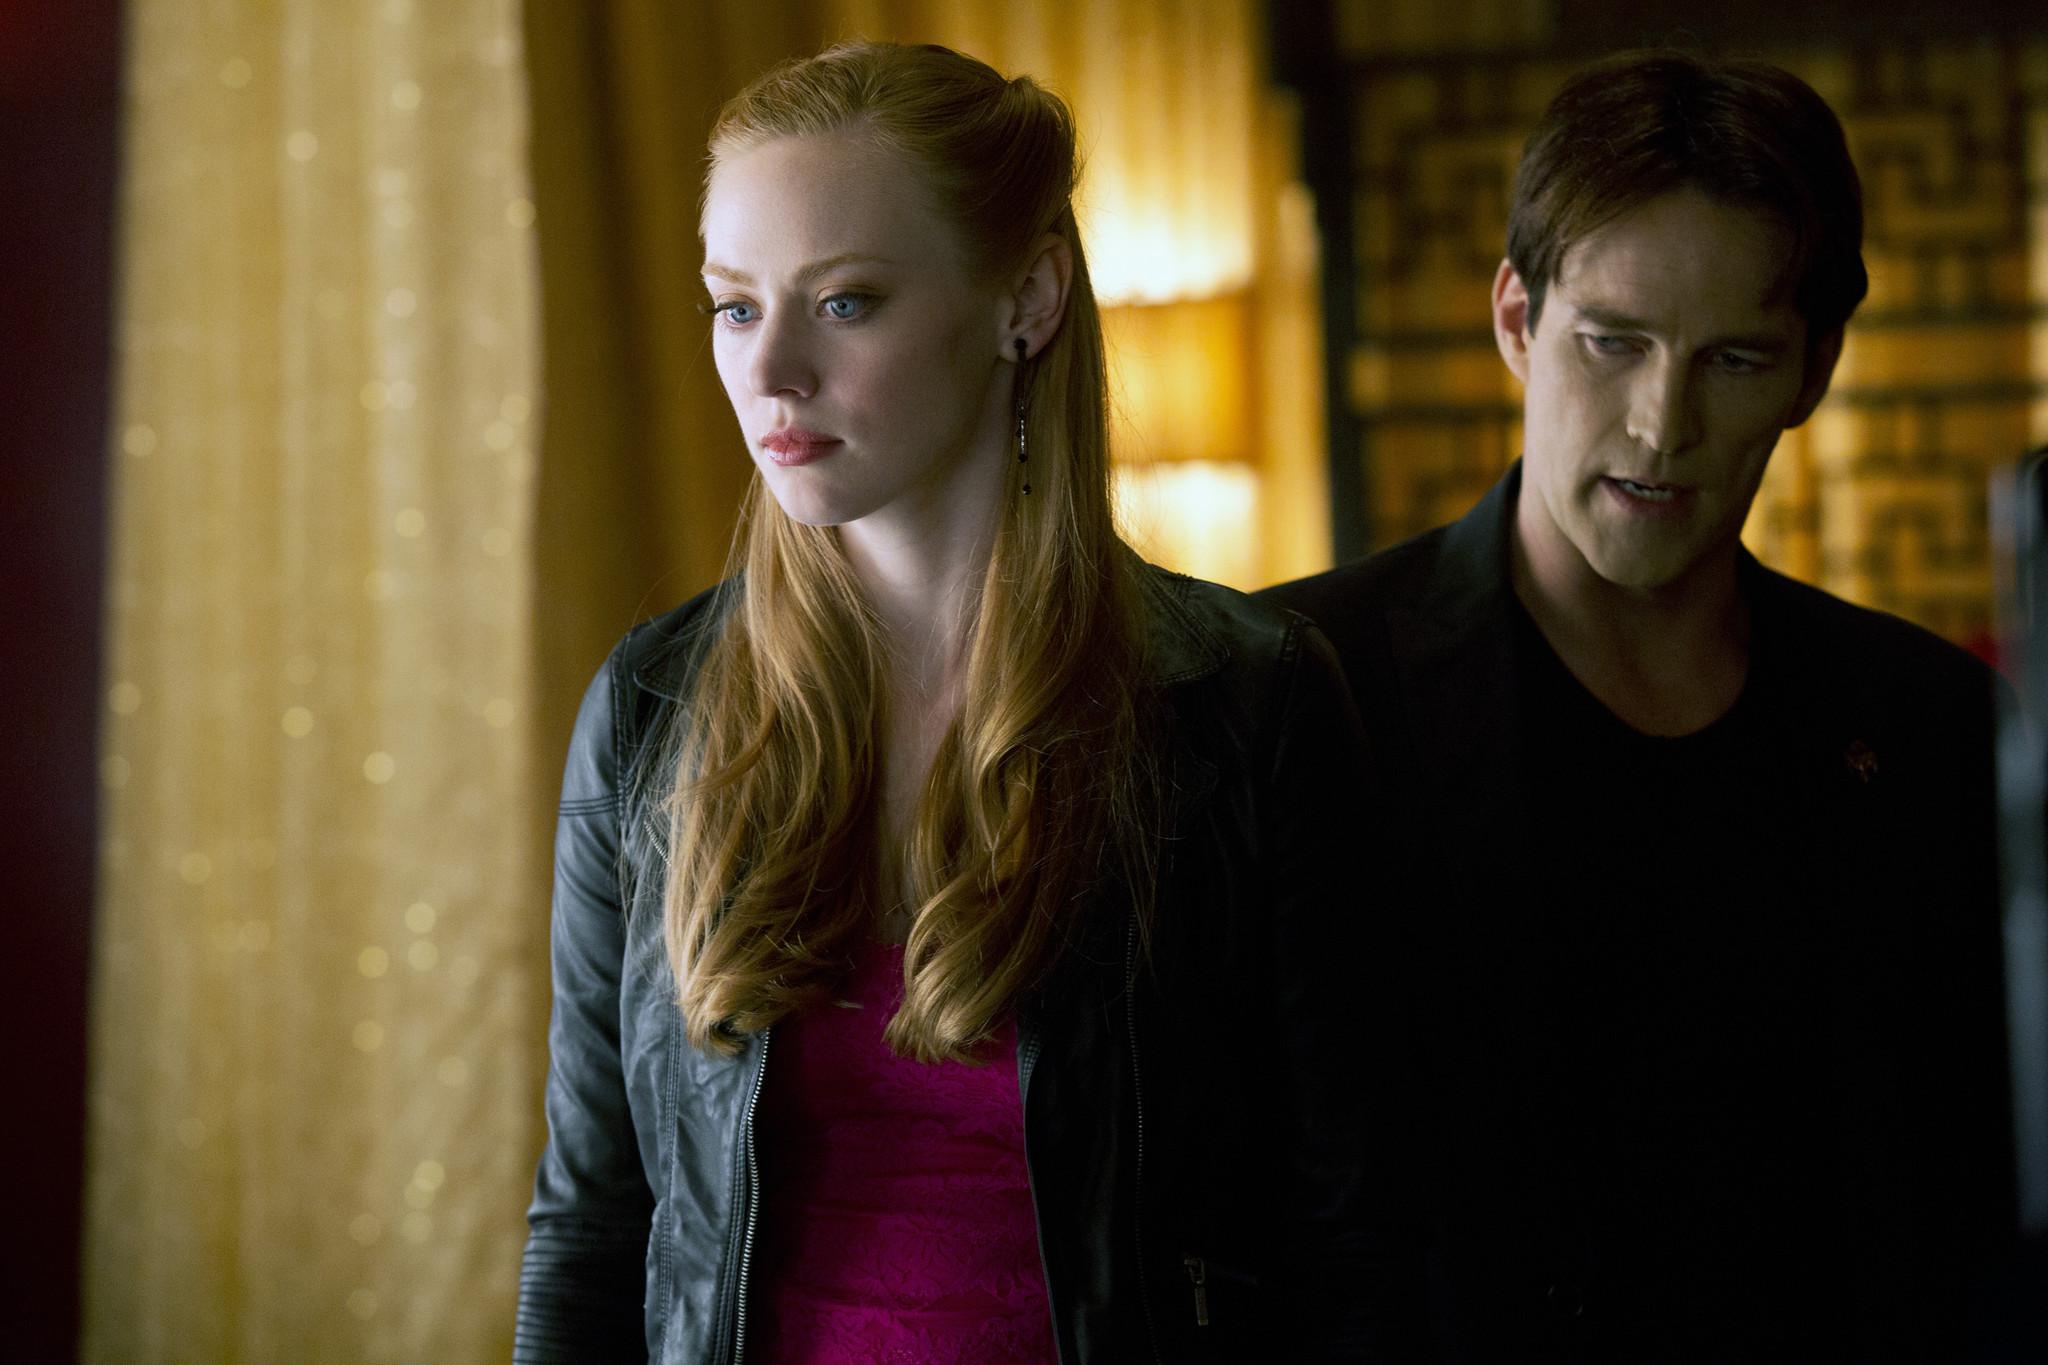 True Blood' recap: Season 5, Episode 11, 'Sunset